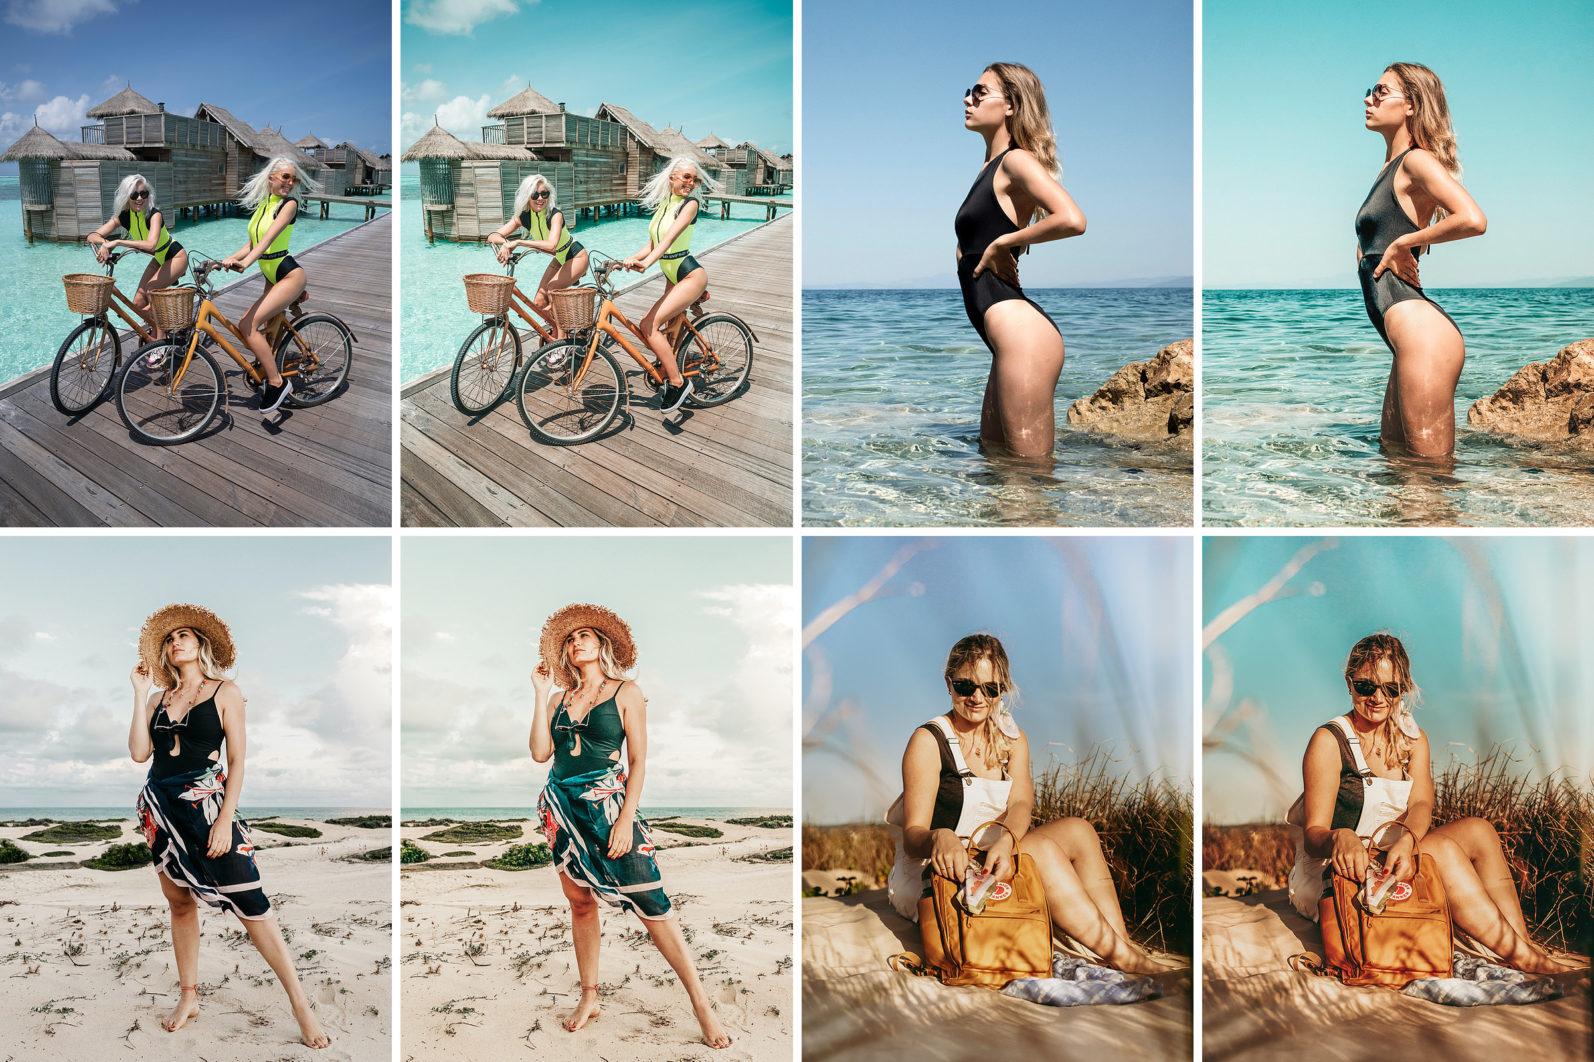 106. Beach Soul Presets - 106.BEACHSOUL 3 -